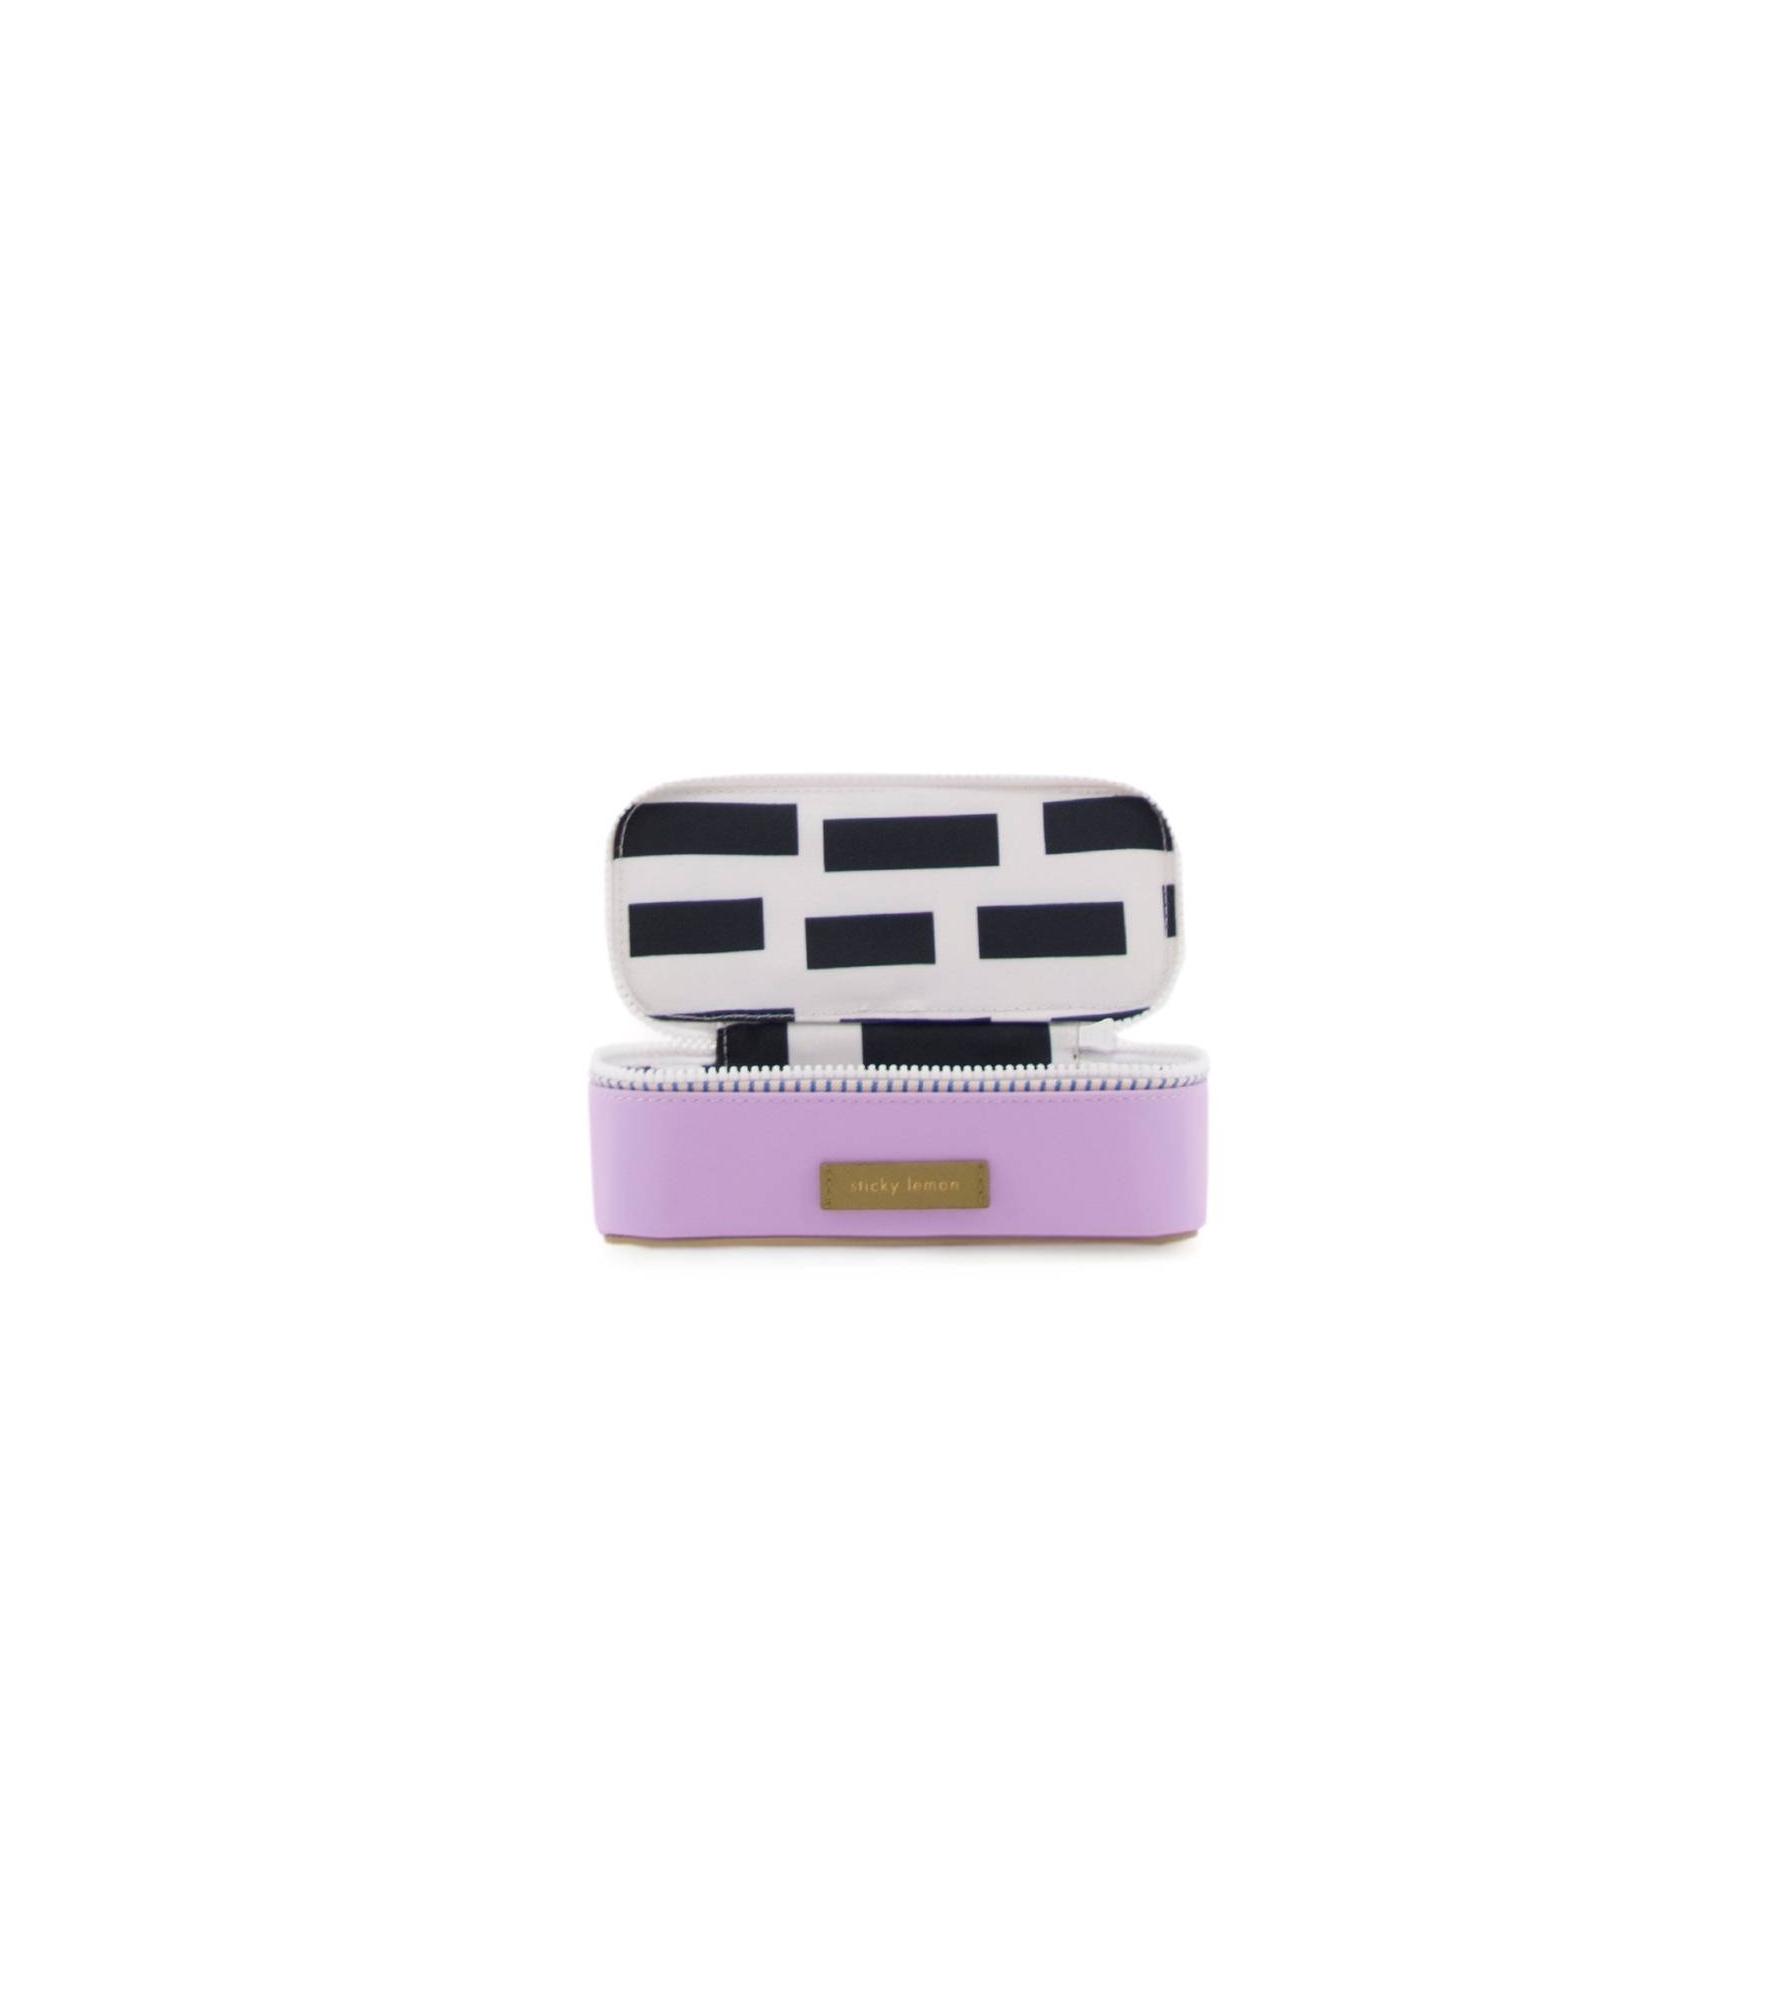 1801421 - Sticky Lemon - pencilbox - Madam olive, gustave lilac, concierge orange - inside _edit.jpg